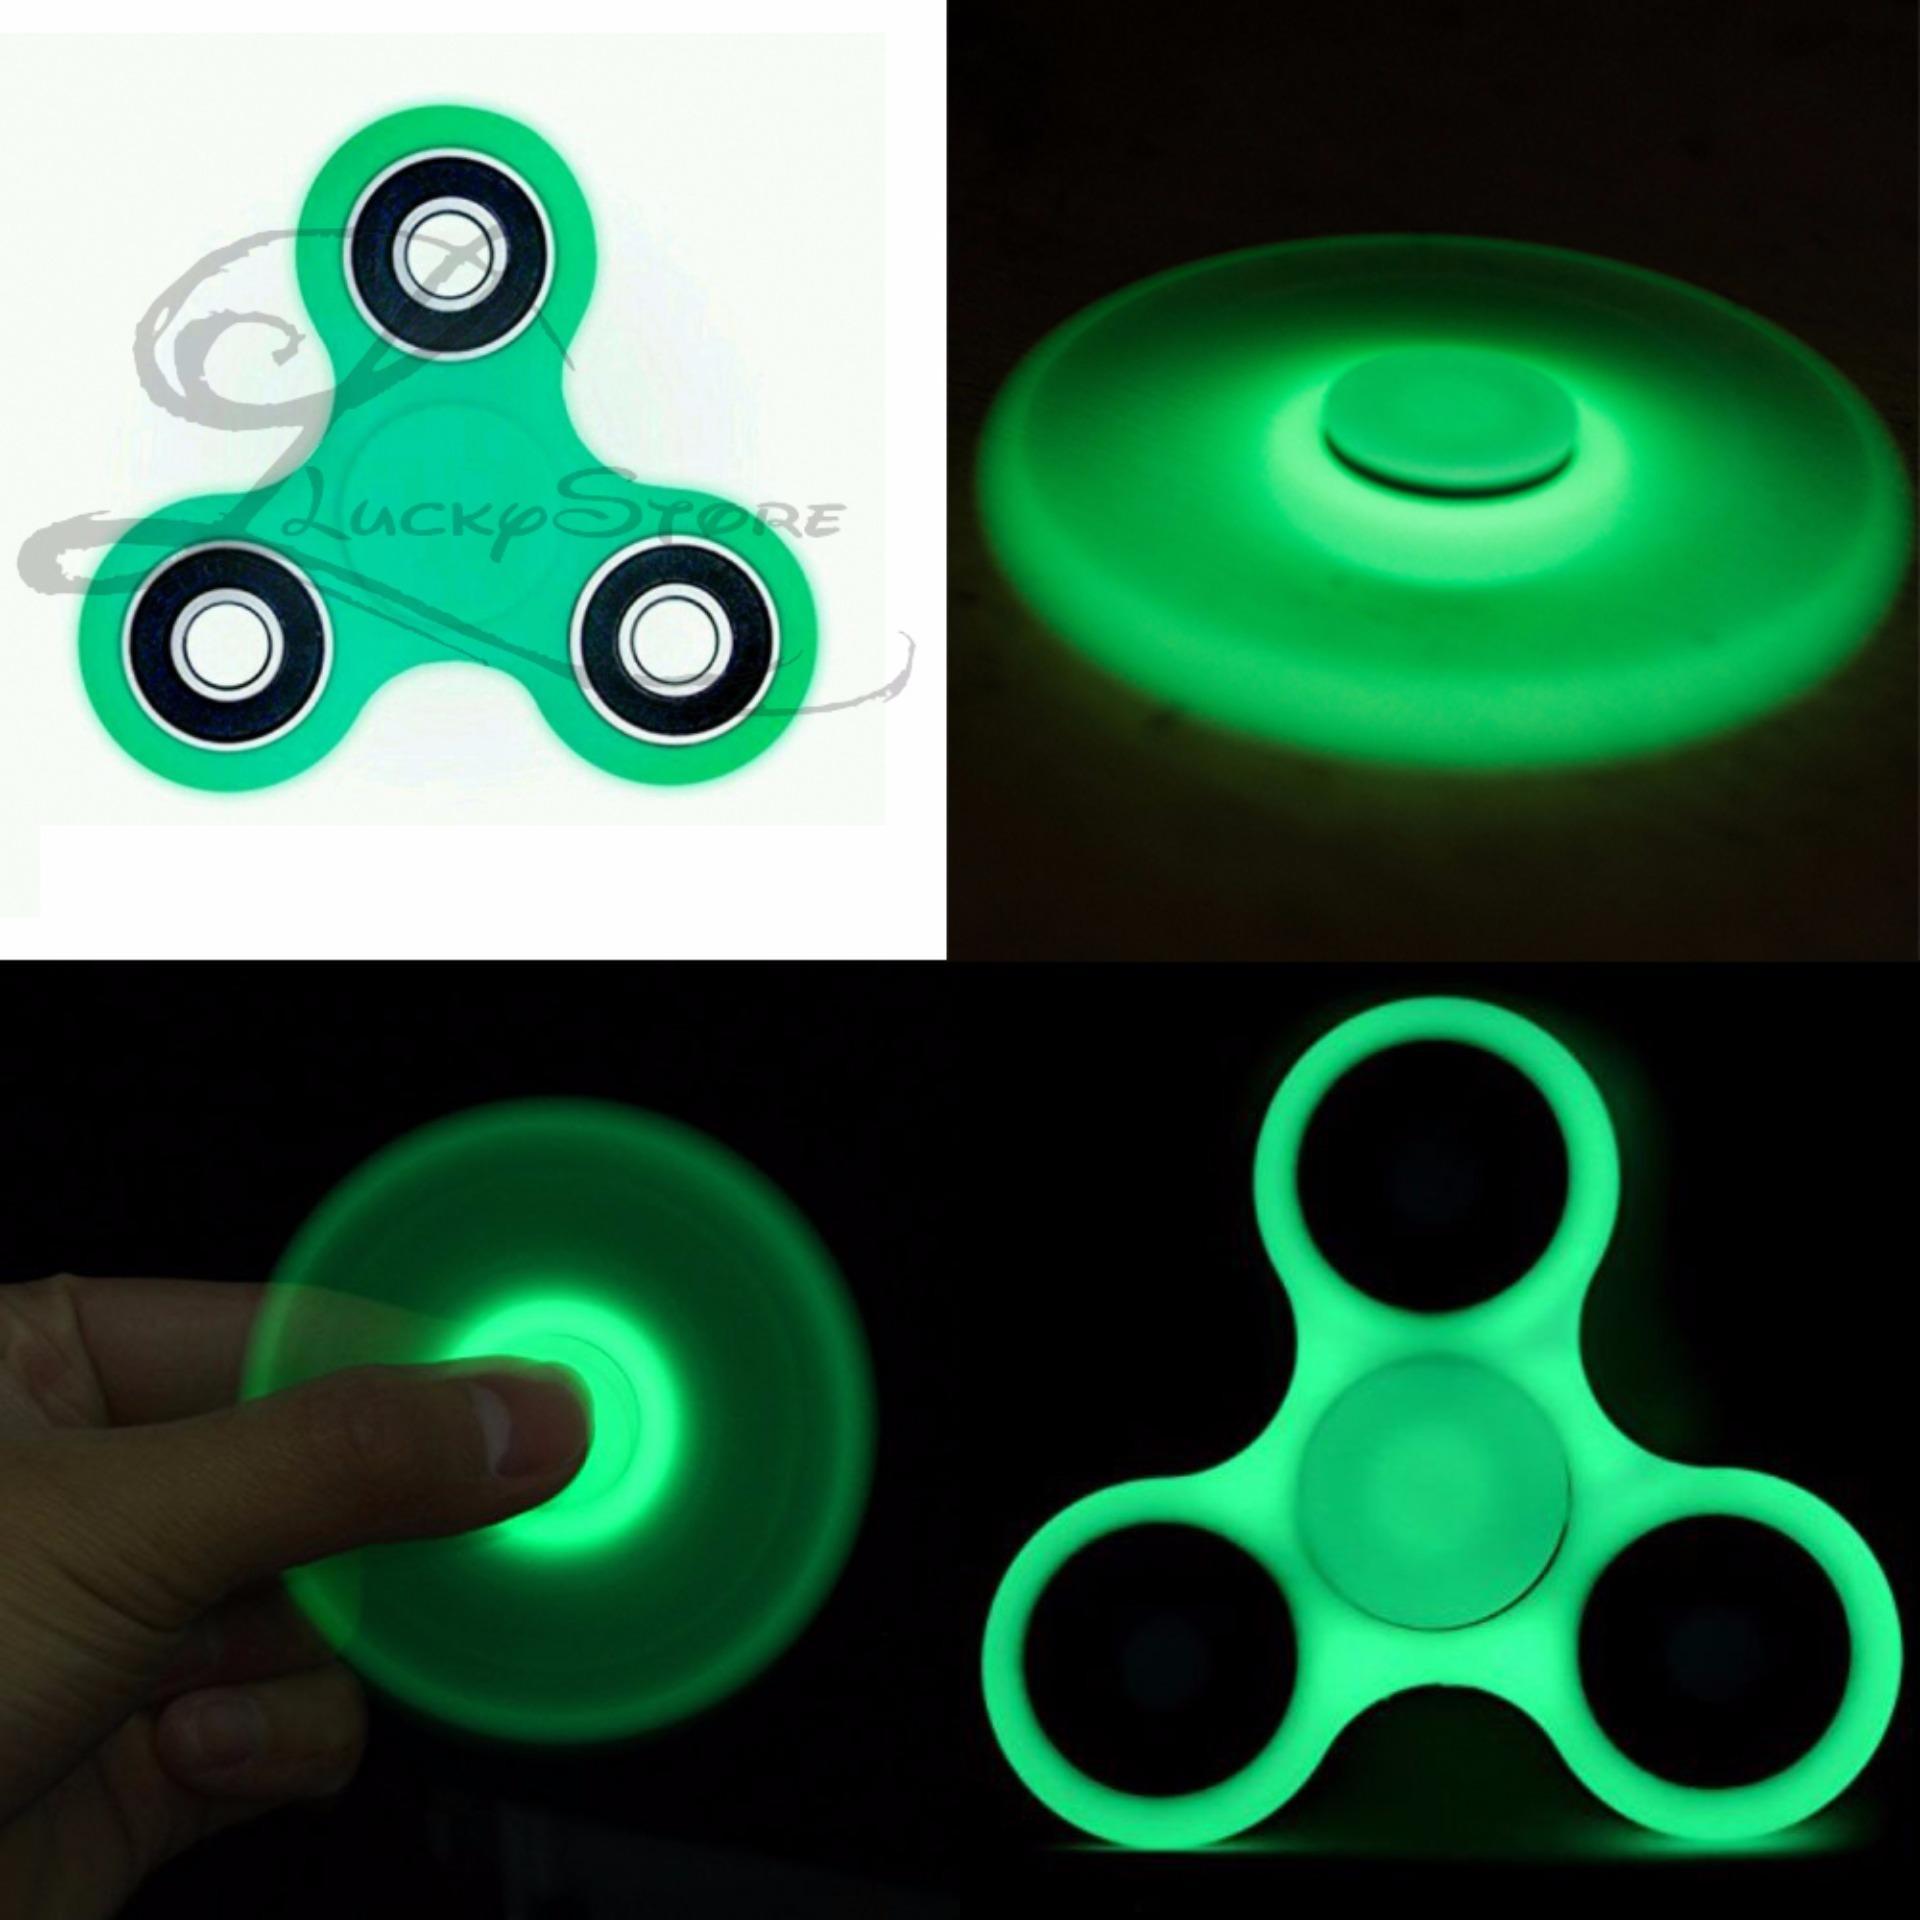 Lucky GLOW IN THE DARK Fidget Spinner Hand Spinner Hand Toys FocusGames / Mainan Spinner Tangan